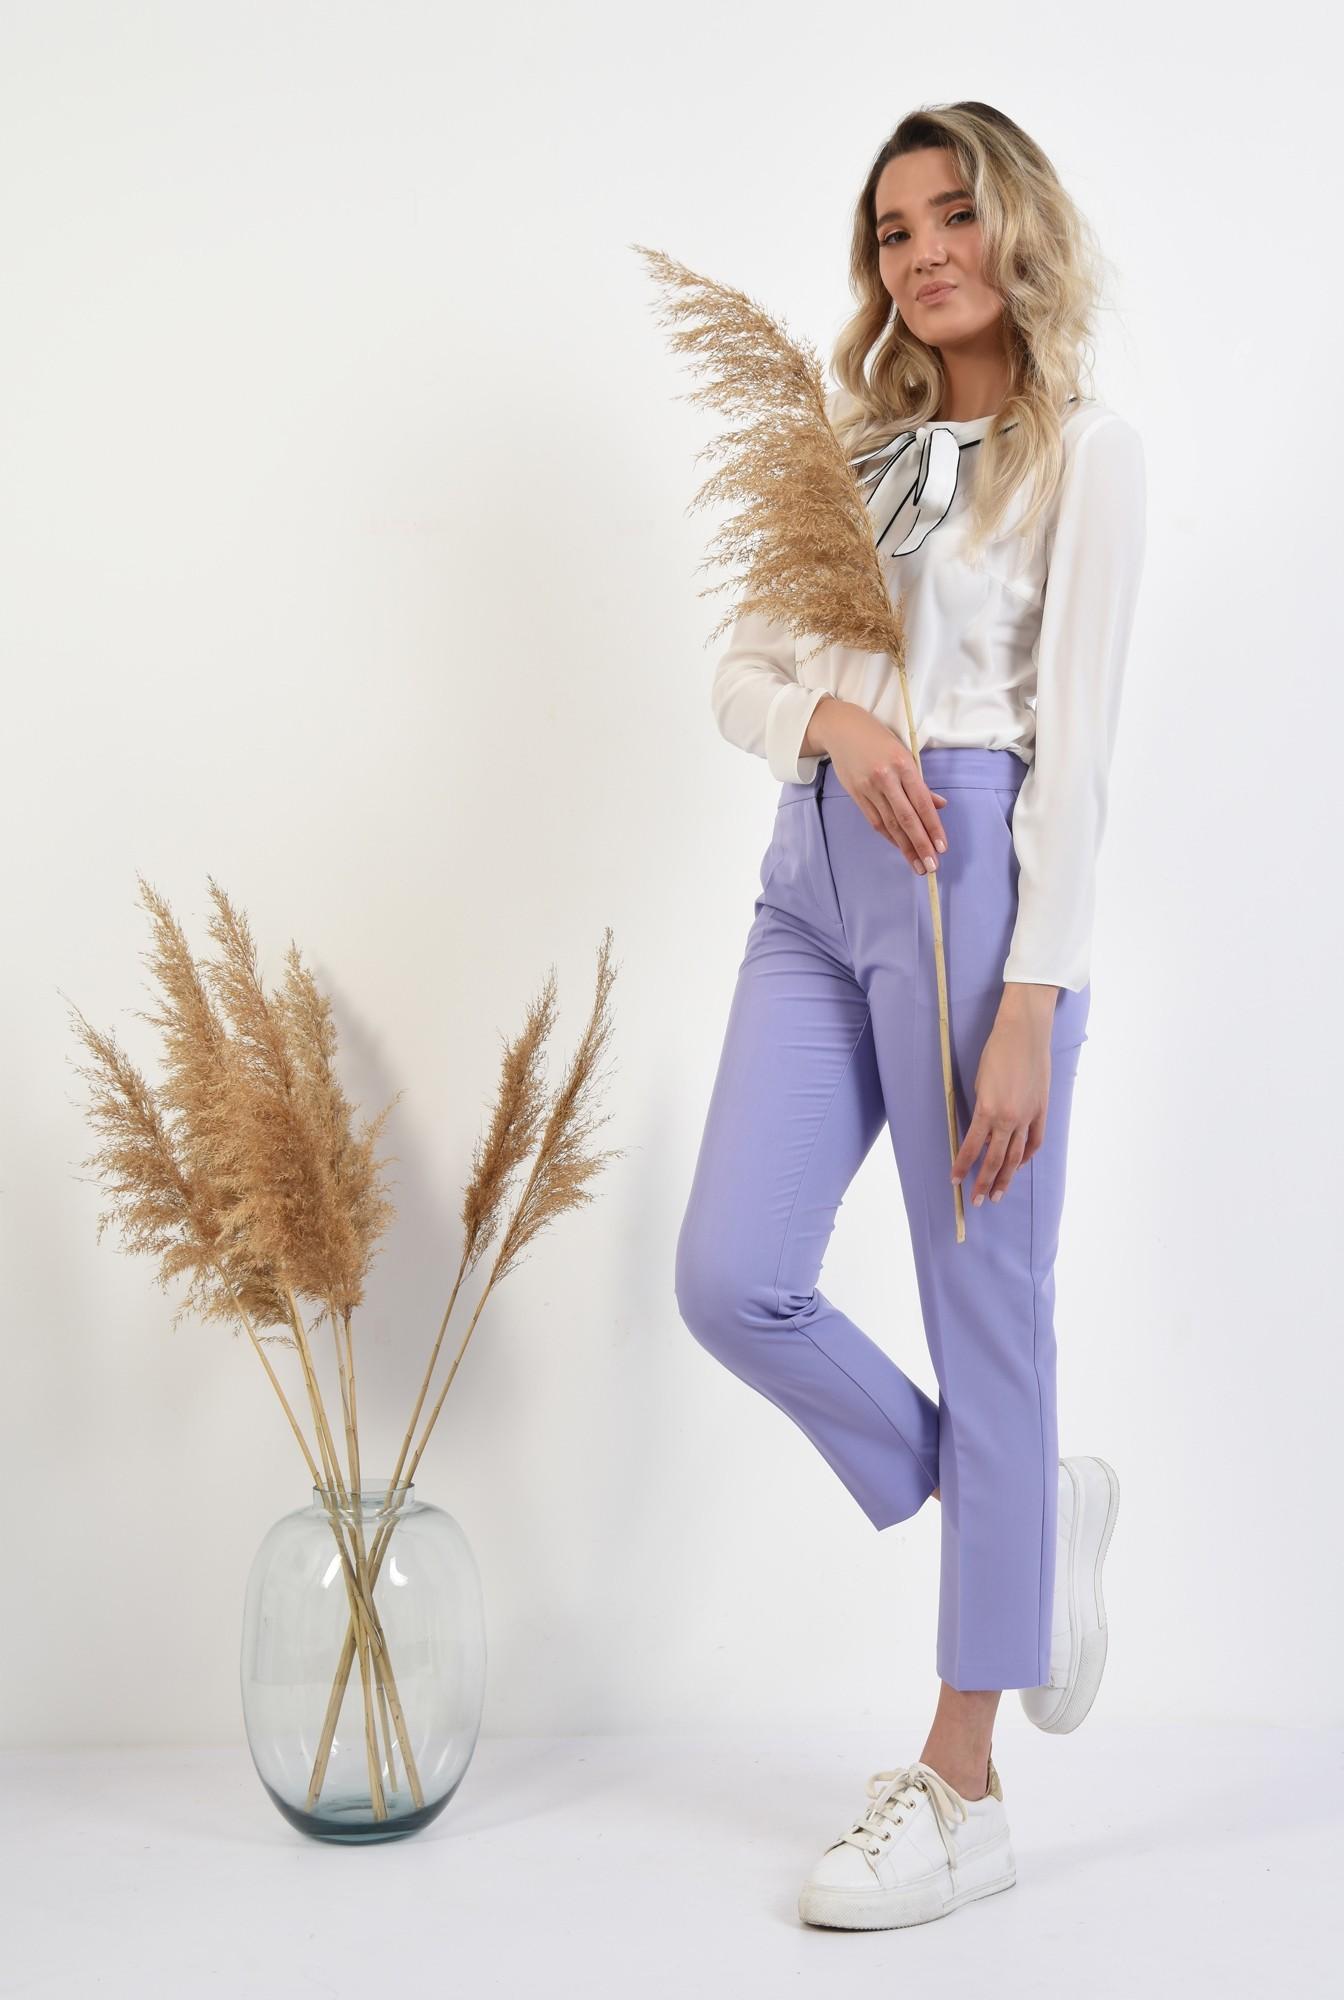 3 - bluza office, maneci lungi, funda cu borduri contrastante, alb, bluza de primavara